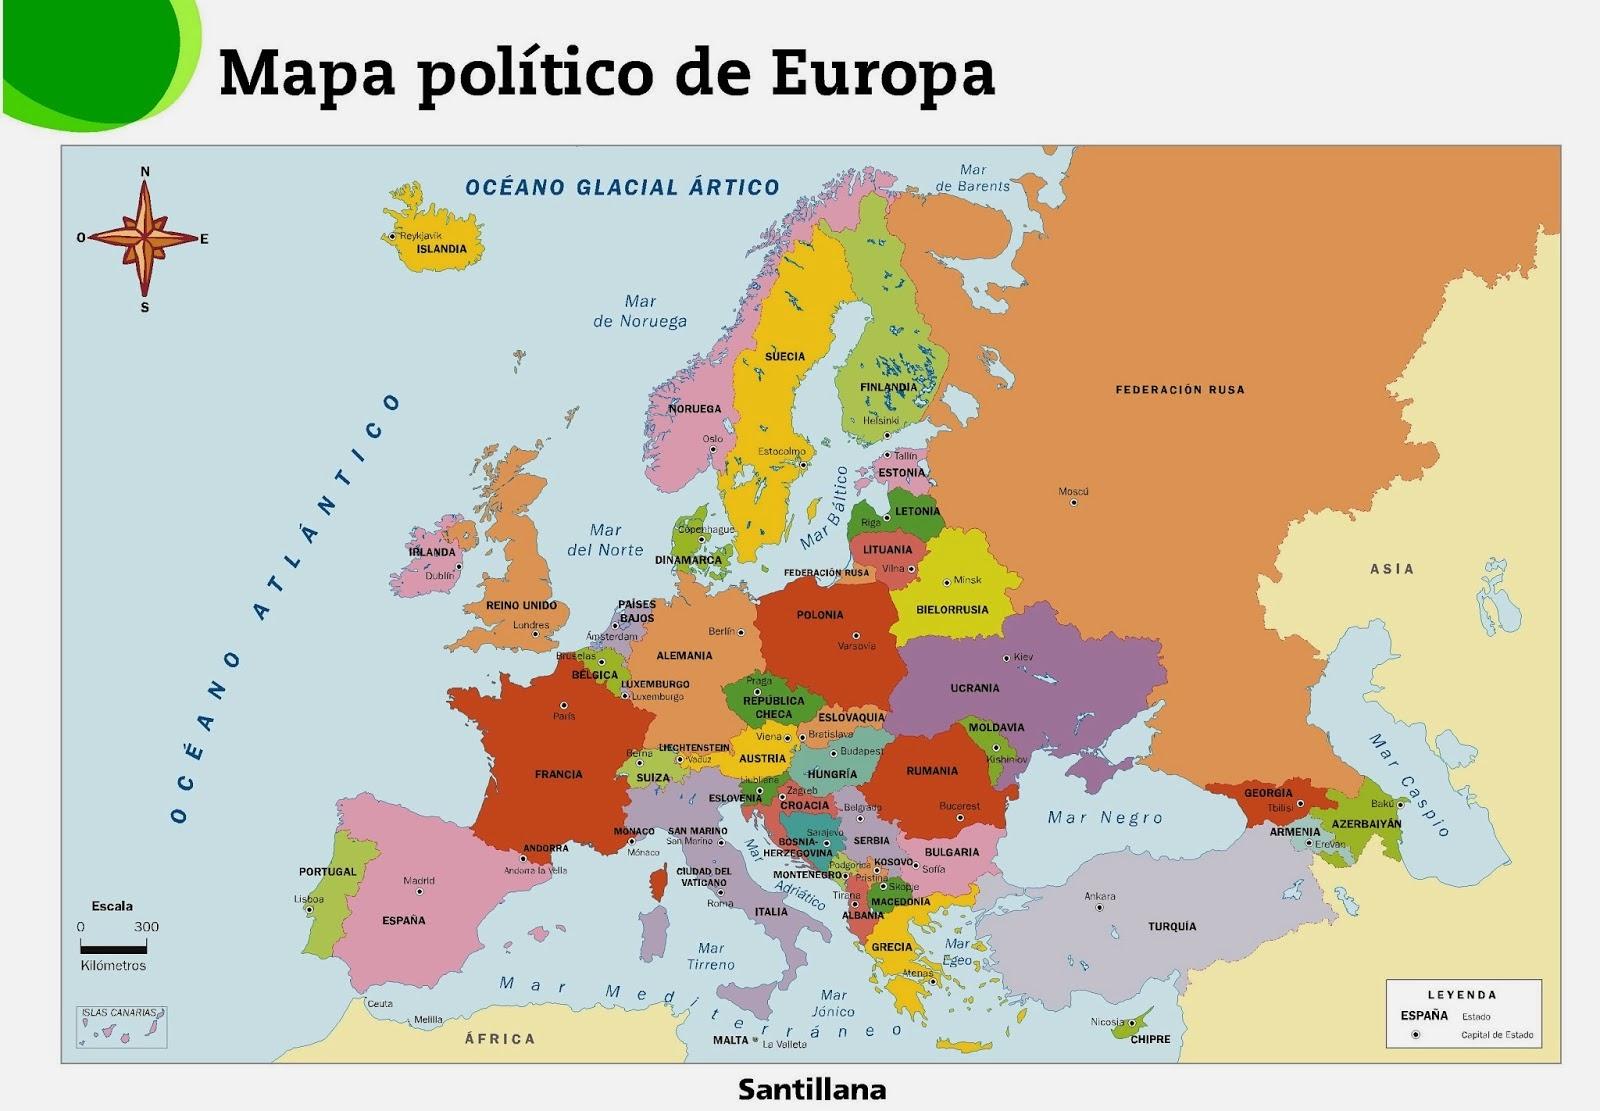 mapa da europa em ingles Infanta Catalina   6th course 2014/2015: Mapa político de Europa  mapa da europa em ingles